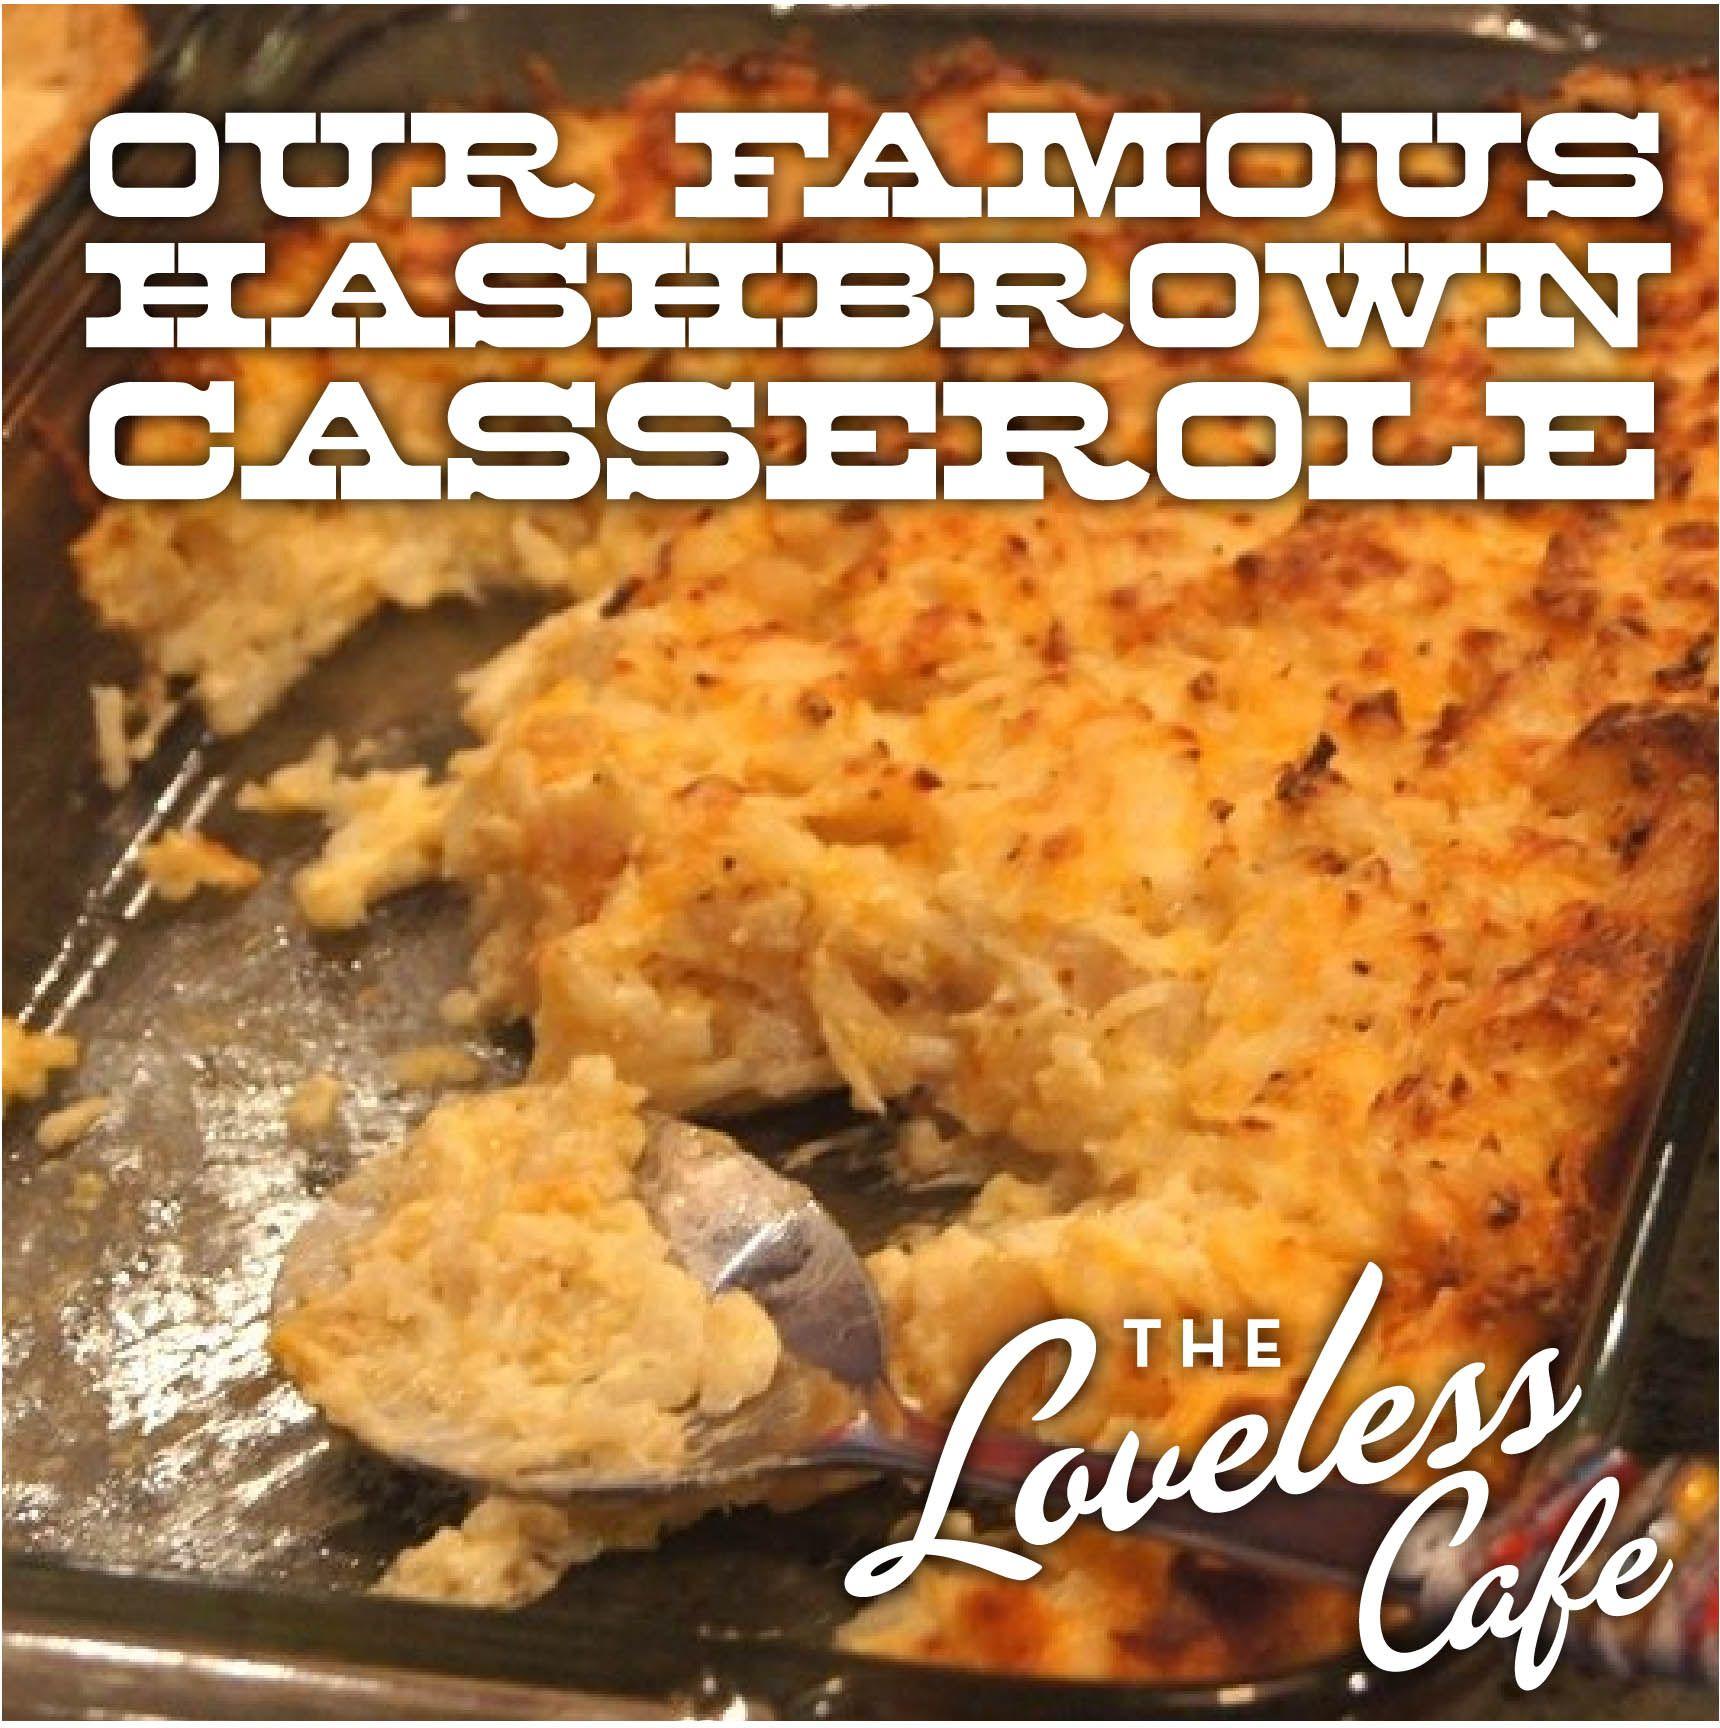 Hashbrown Casserole Recipe Loveless Cafe Recipes Recipes Food